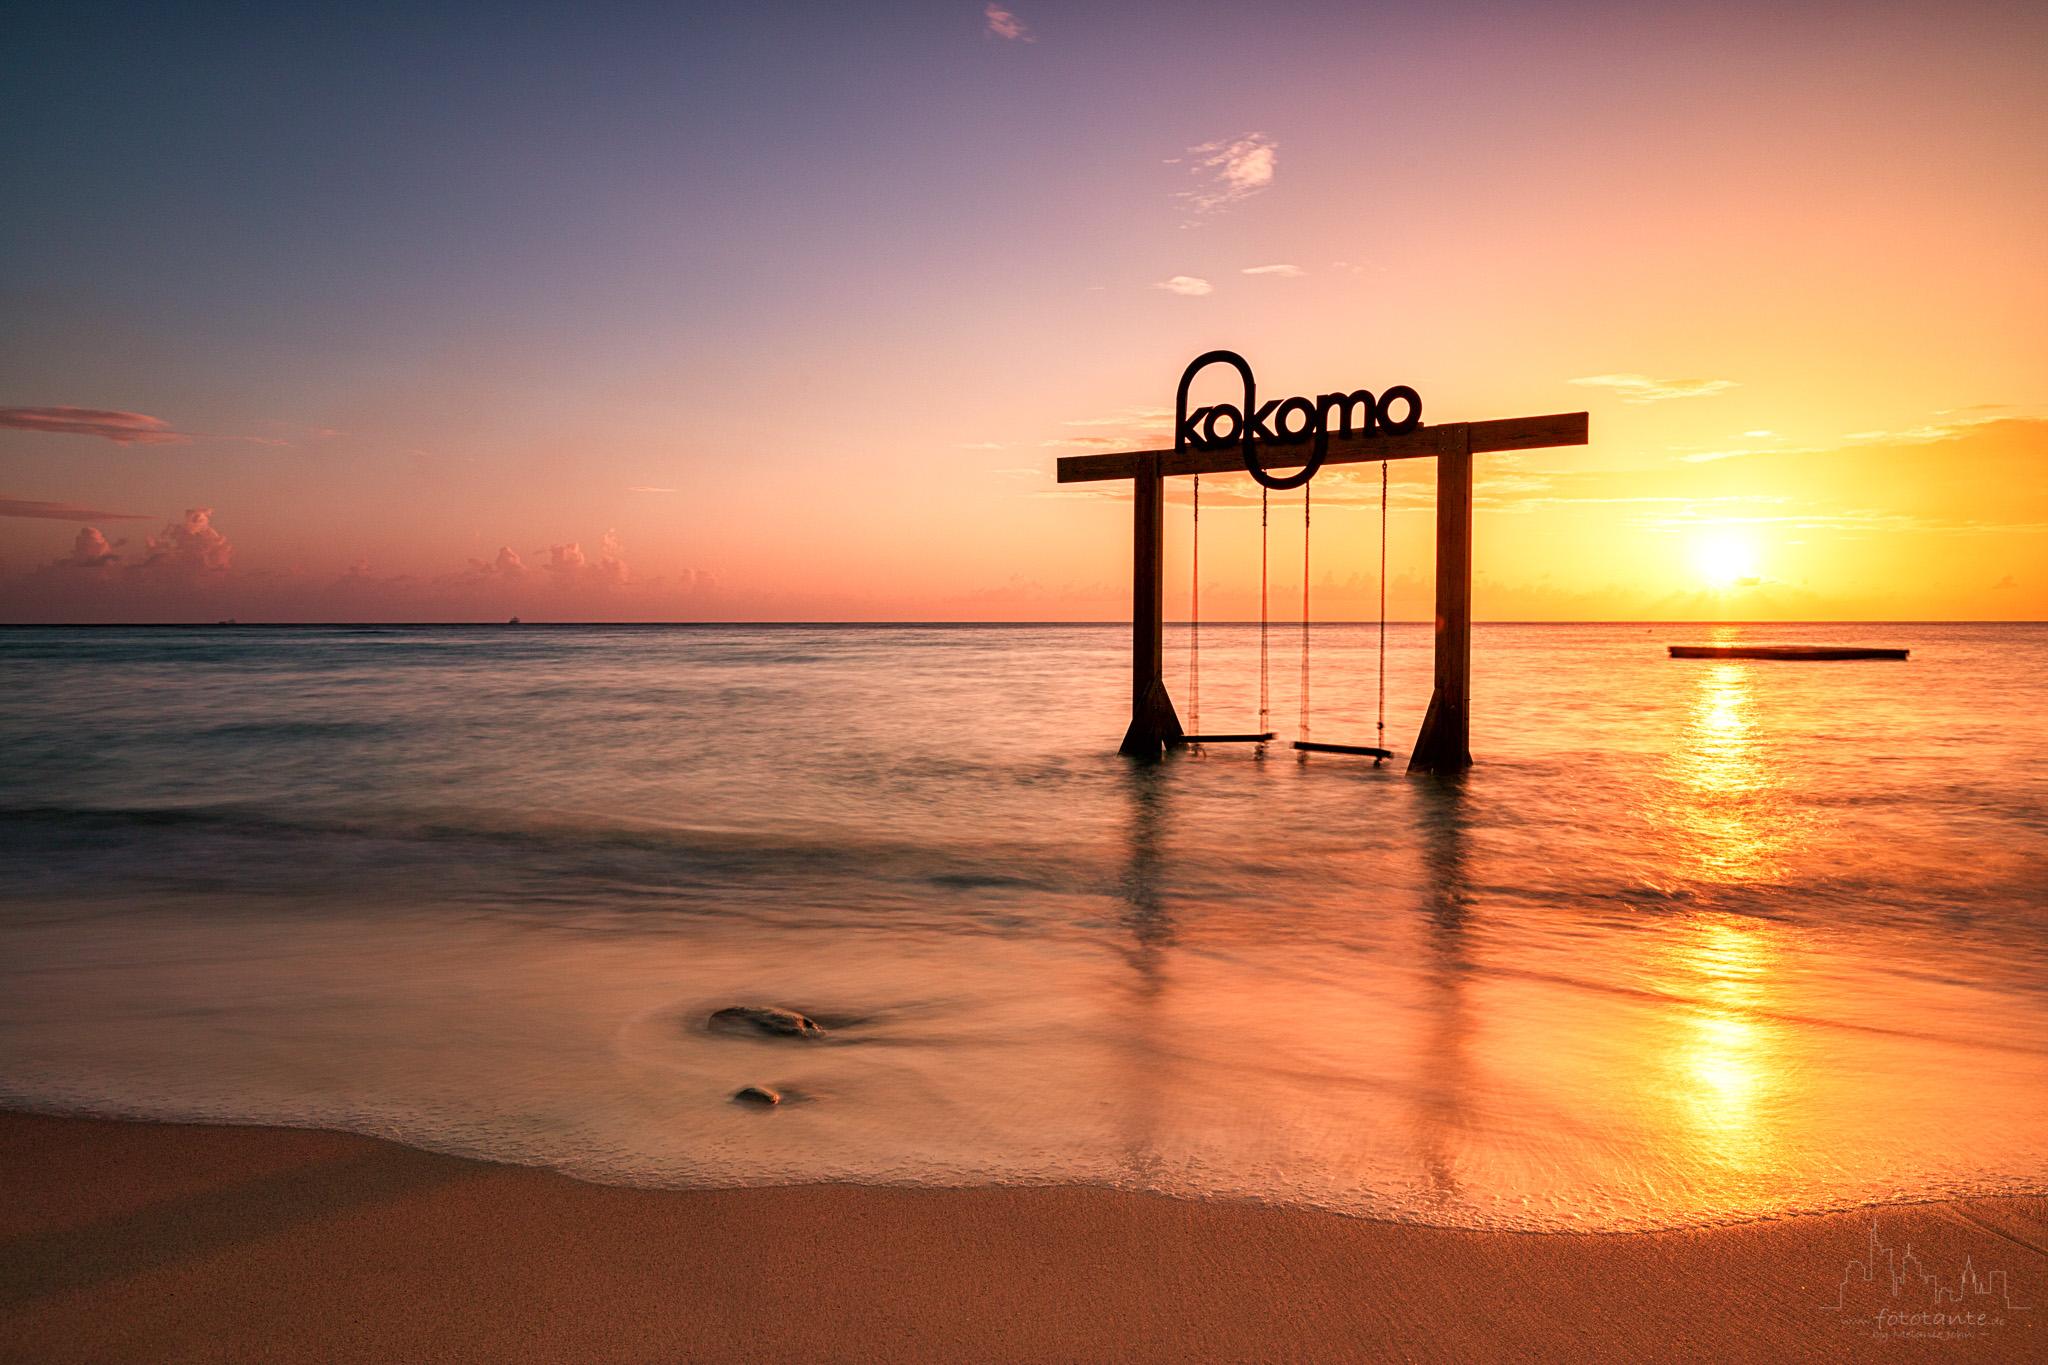 kokomo-beach-curacao_l